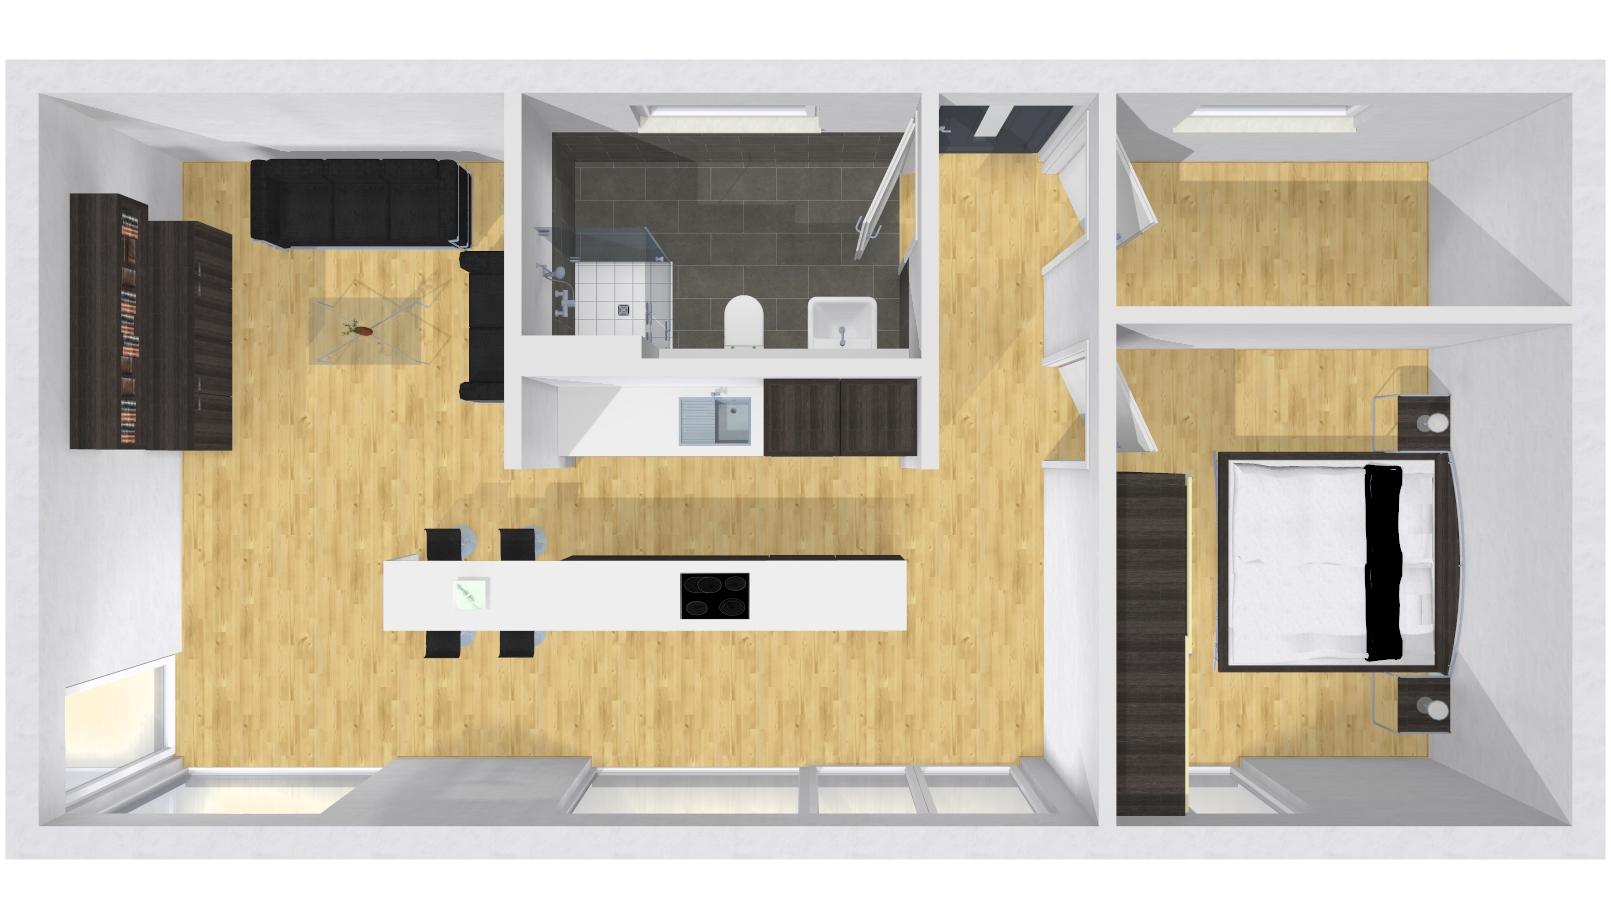 Ferien- Wochenendhaus_BASIS MH Itzelberg_3D Grundriss 01.jpg